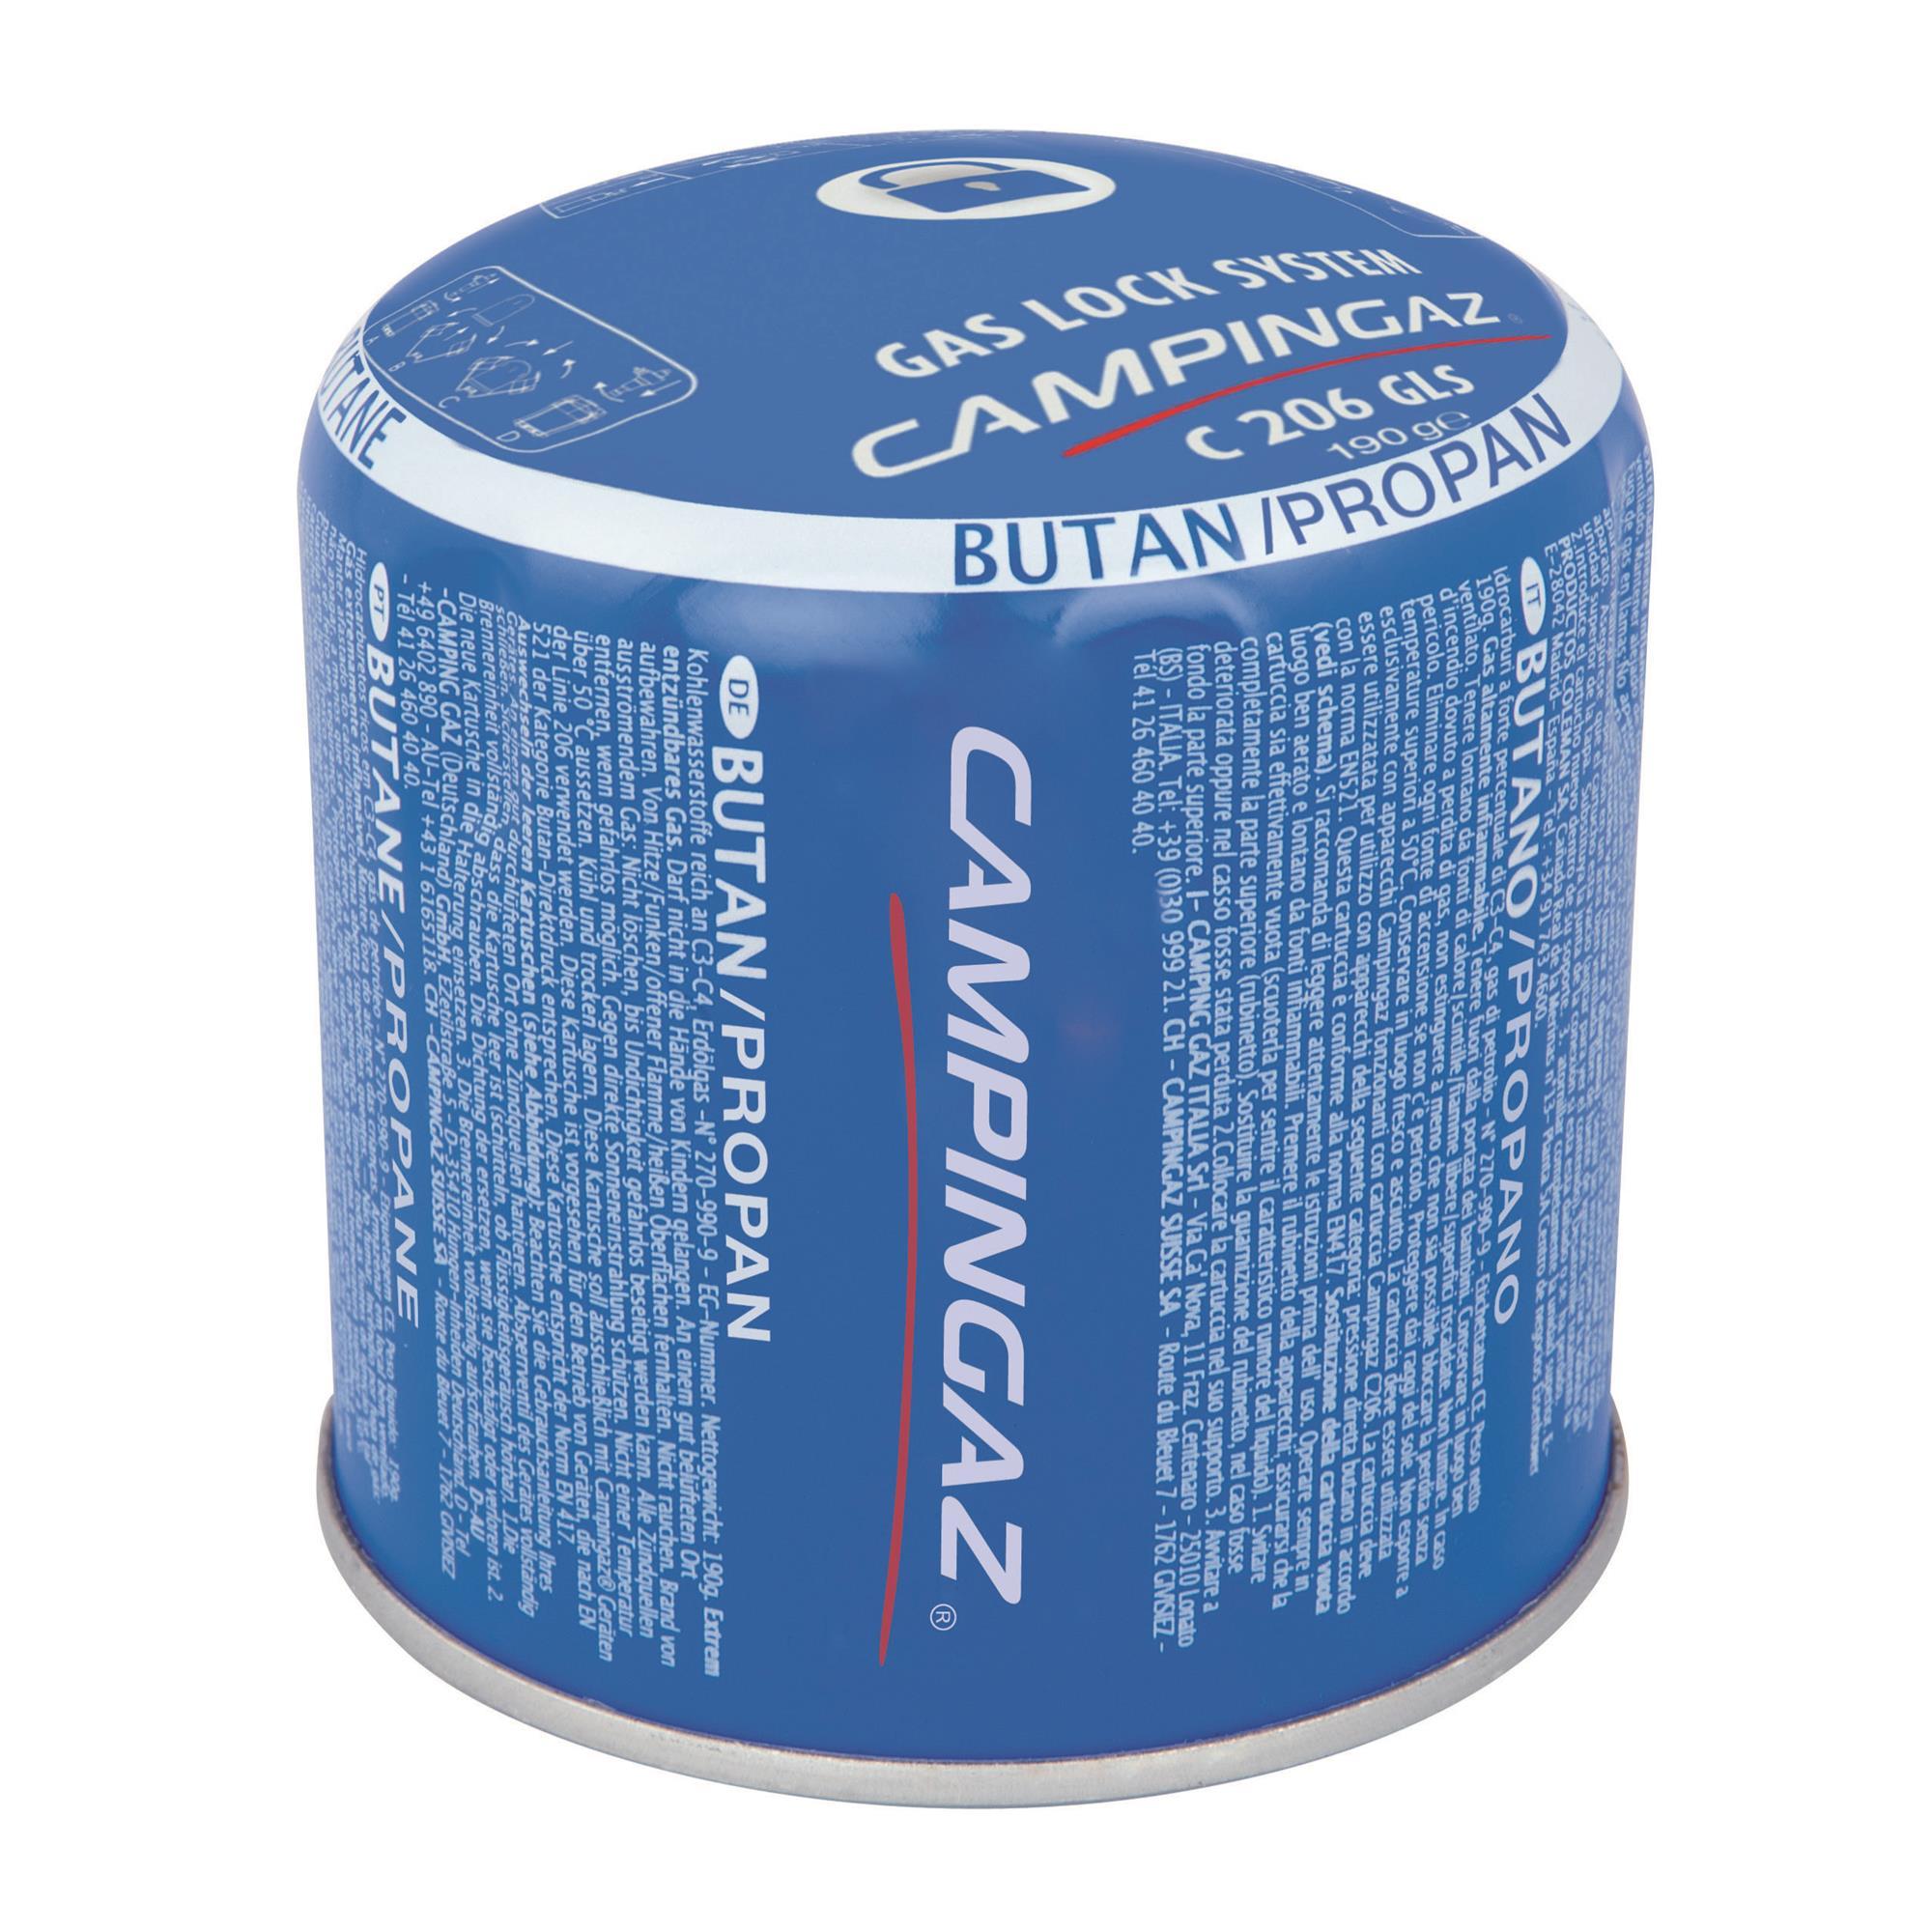 Campingaz C 206 GLS Super Stechkartusche